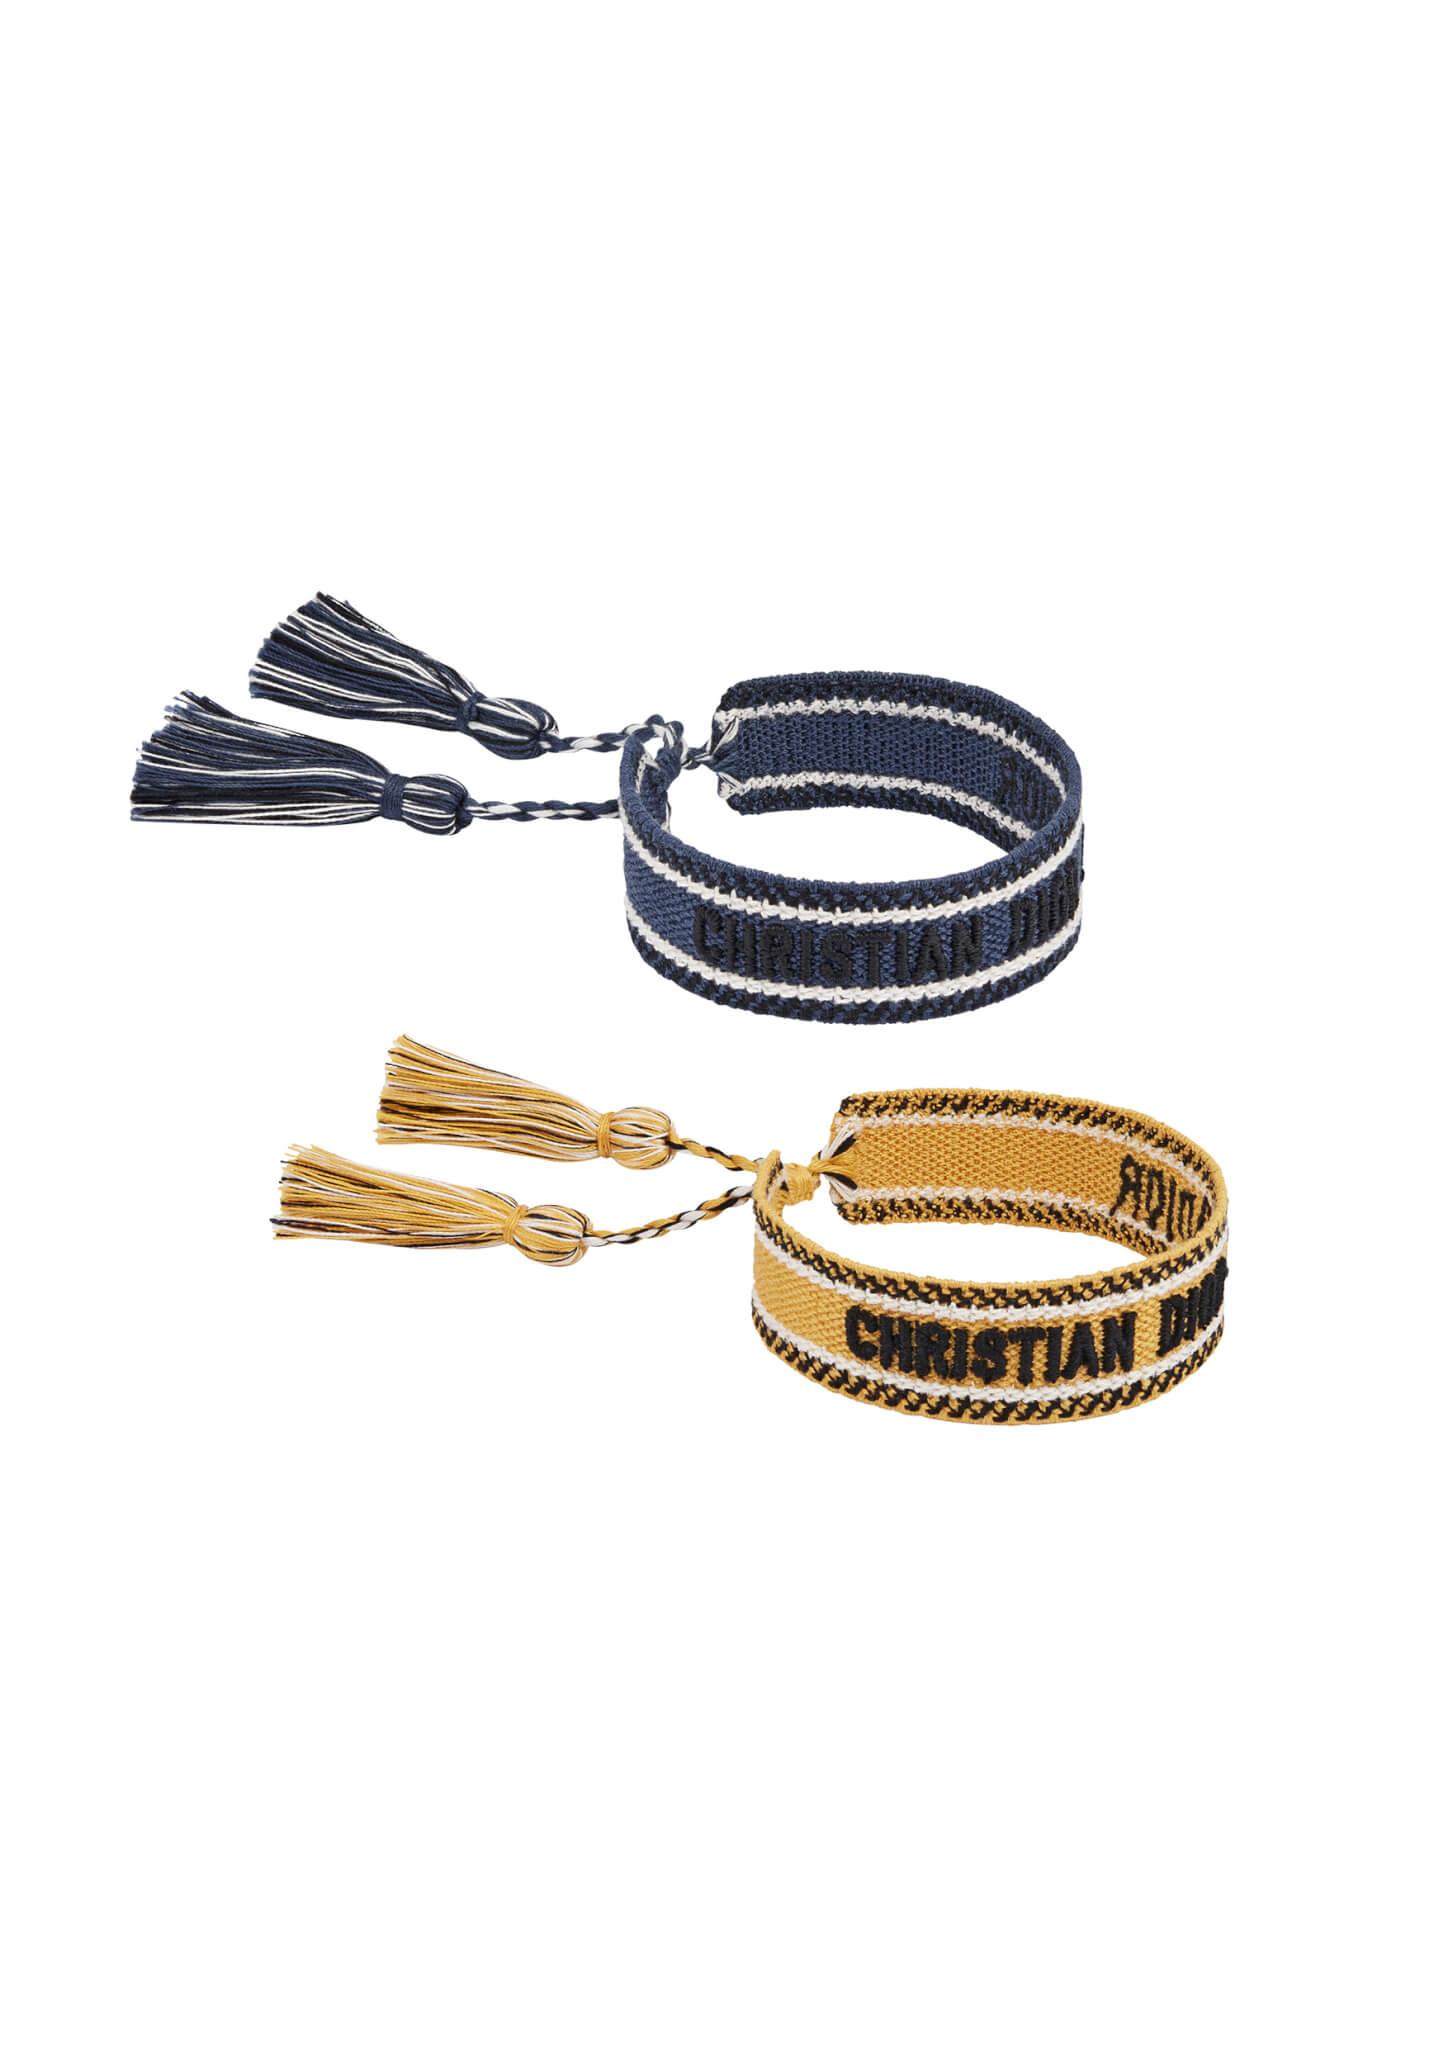 dior_cruise_2020_packshots_bracelets